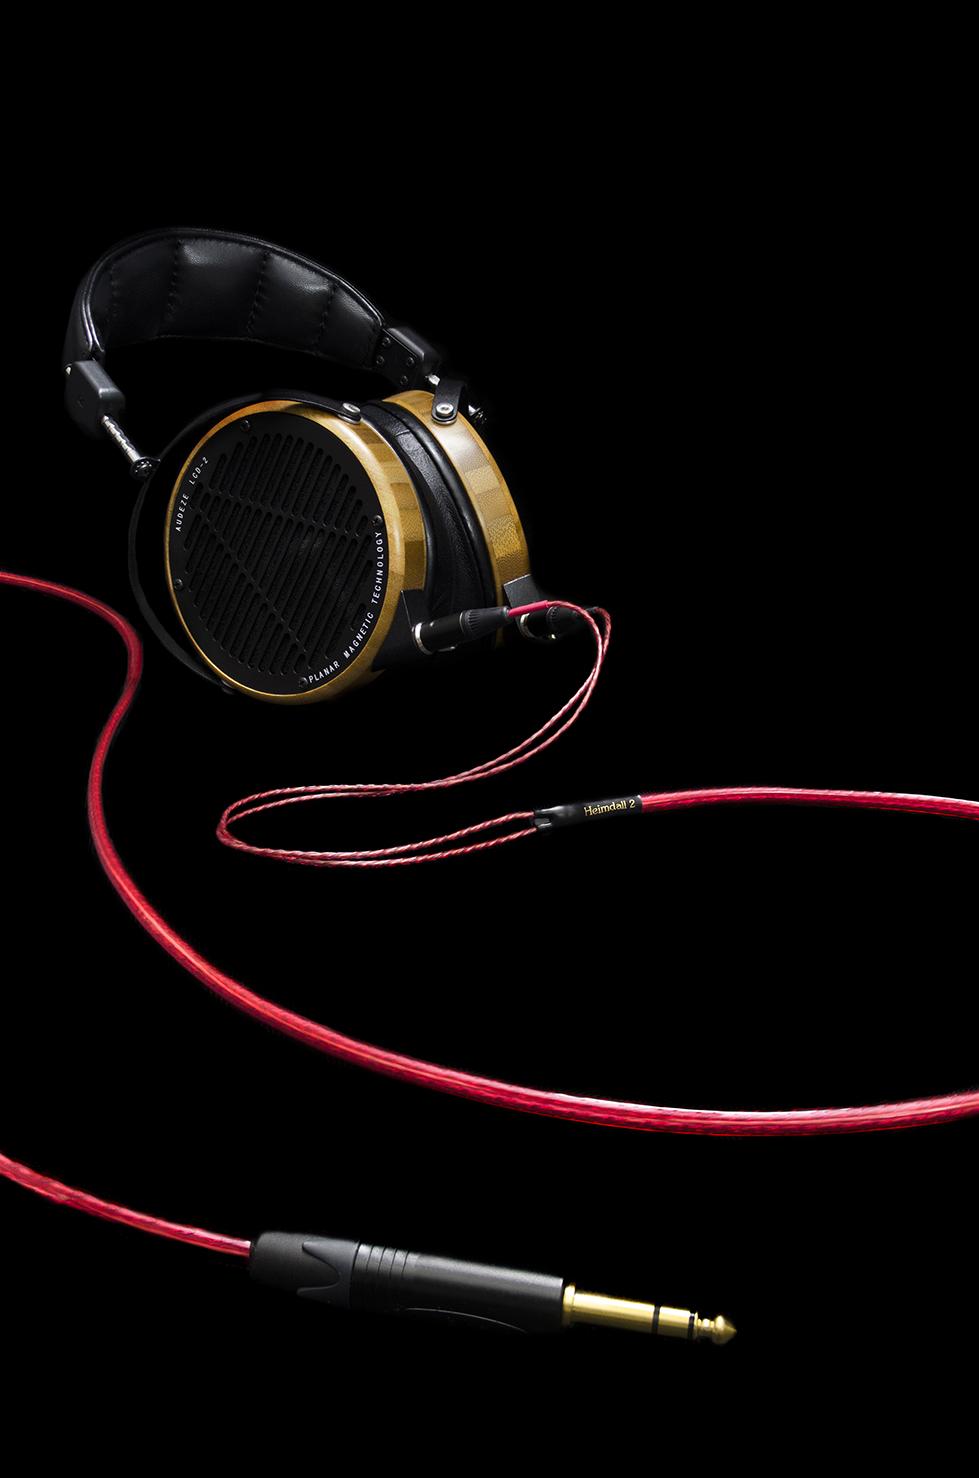 Headphone Cable_LR